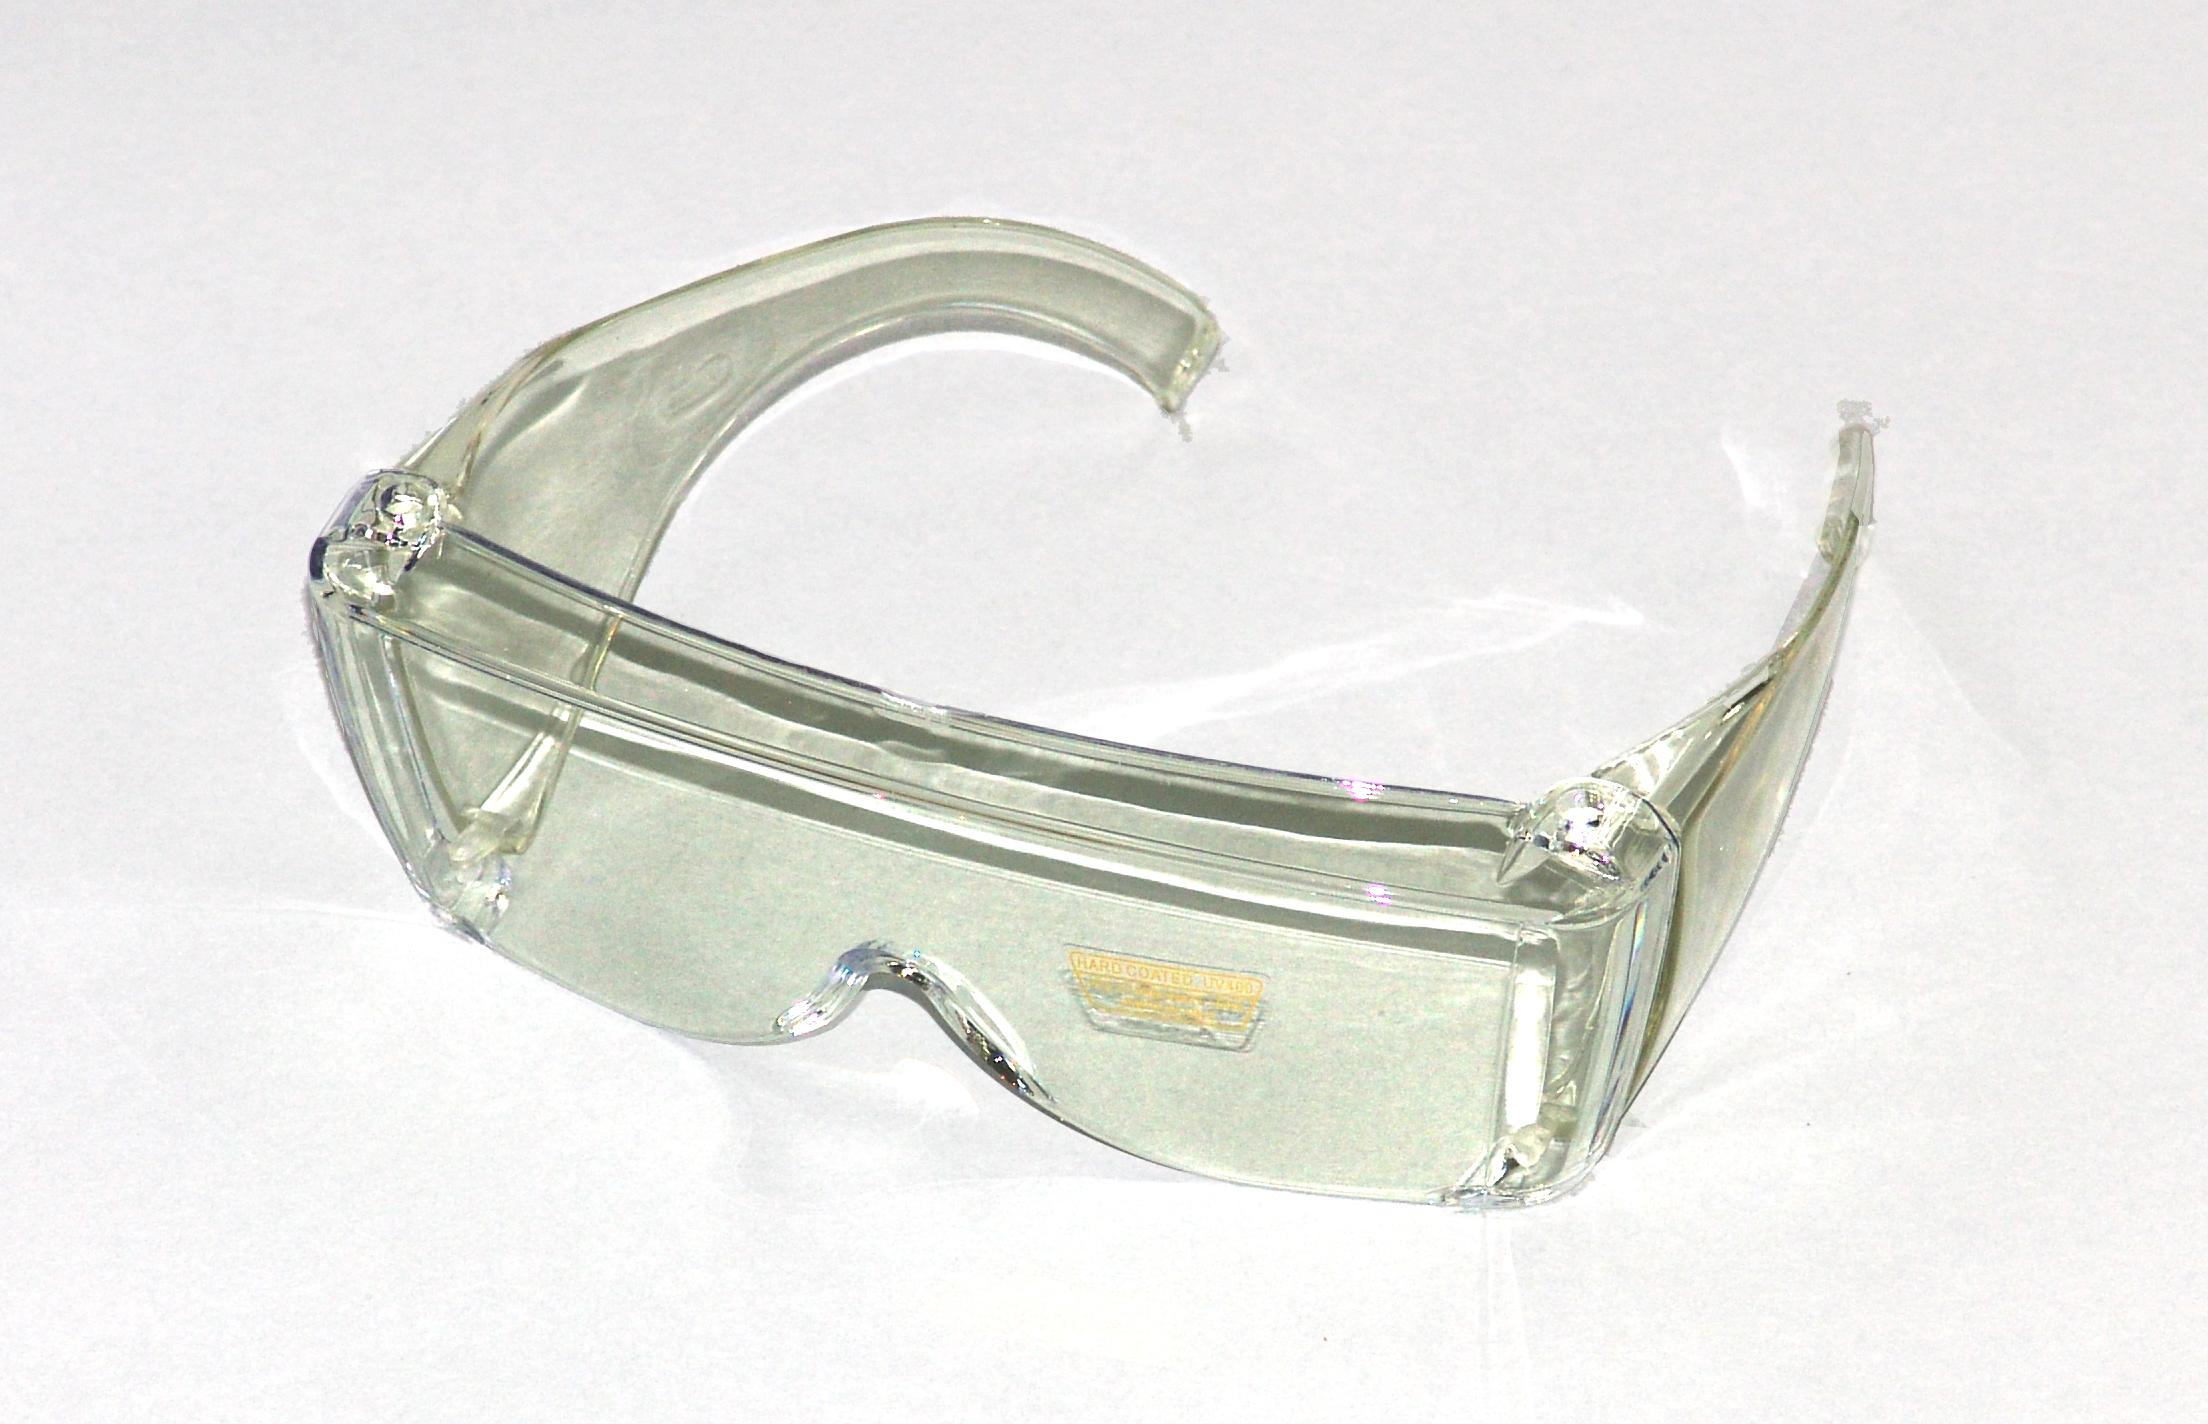 globe globe chemical safety goggles education equipment che